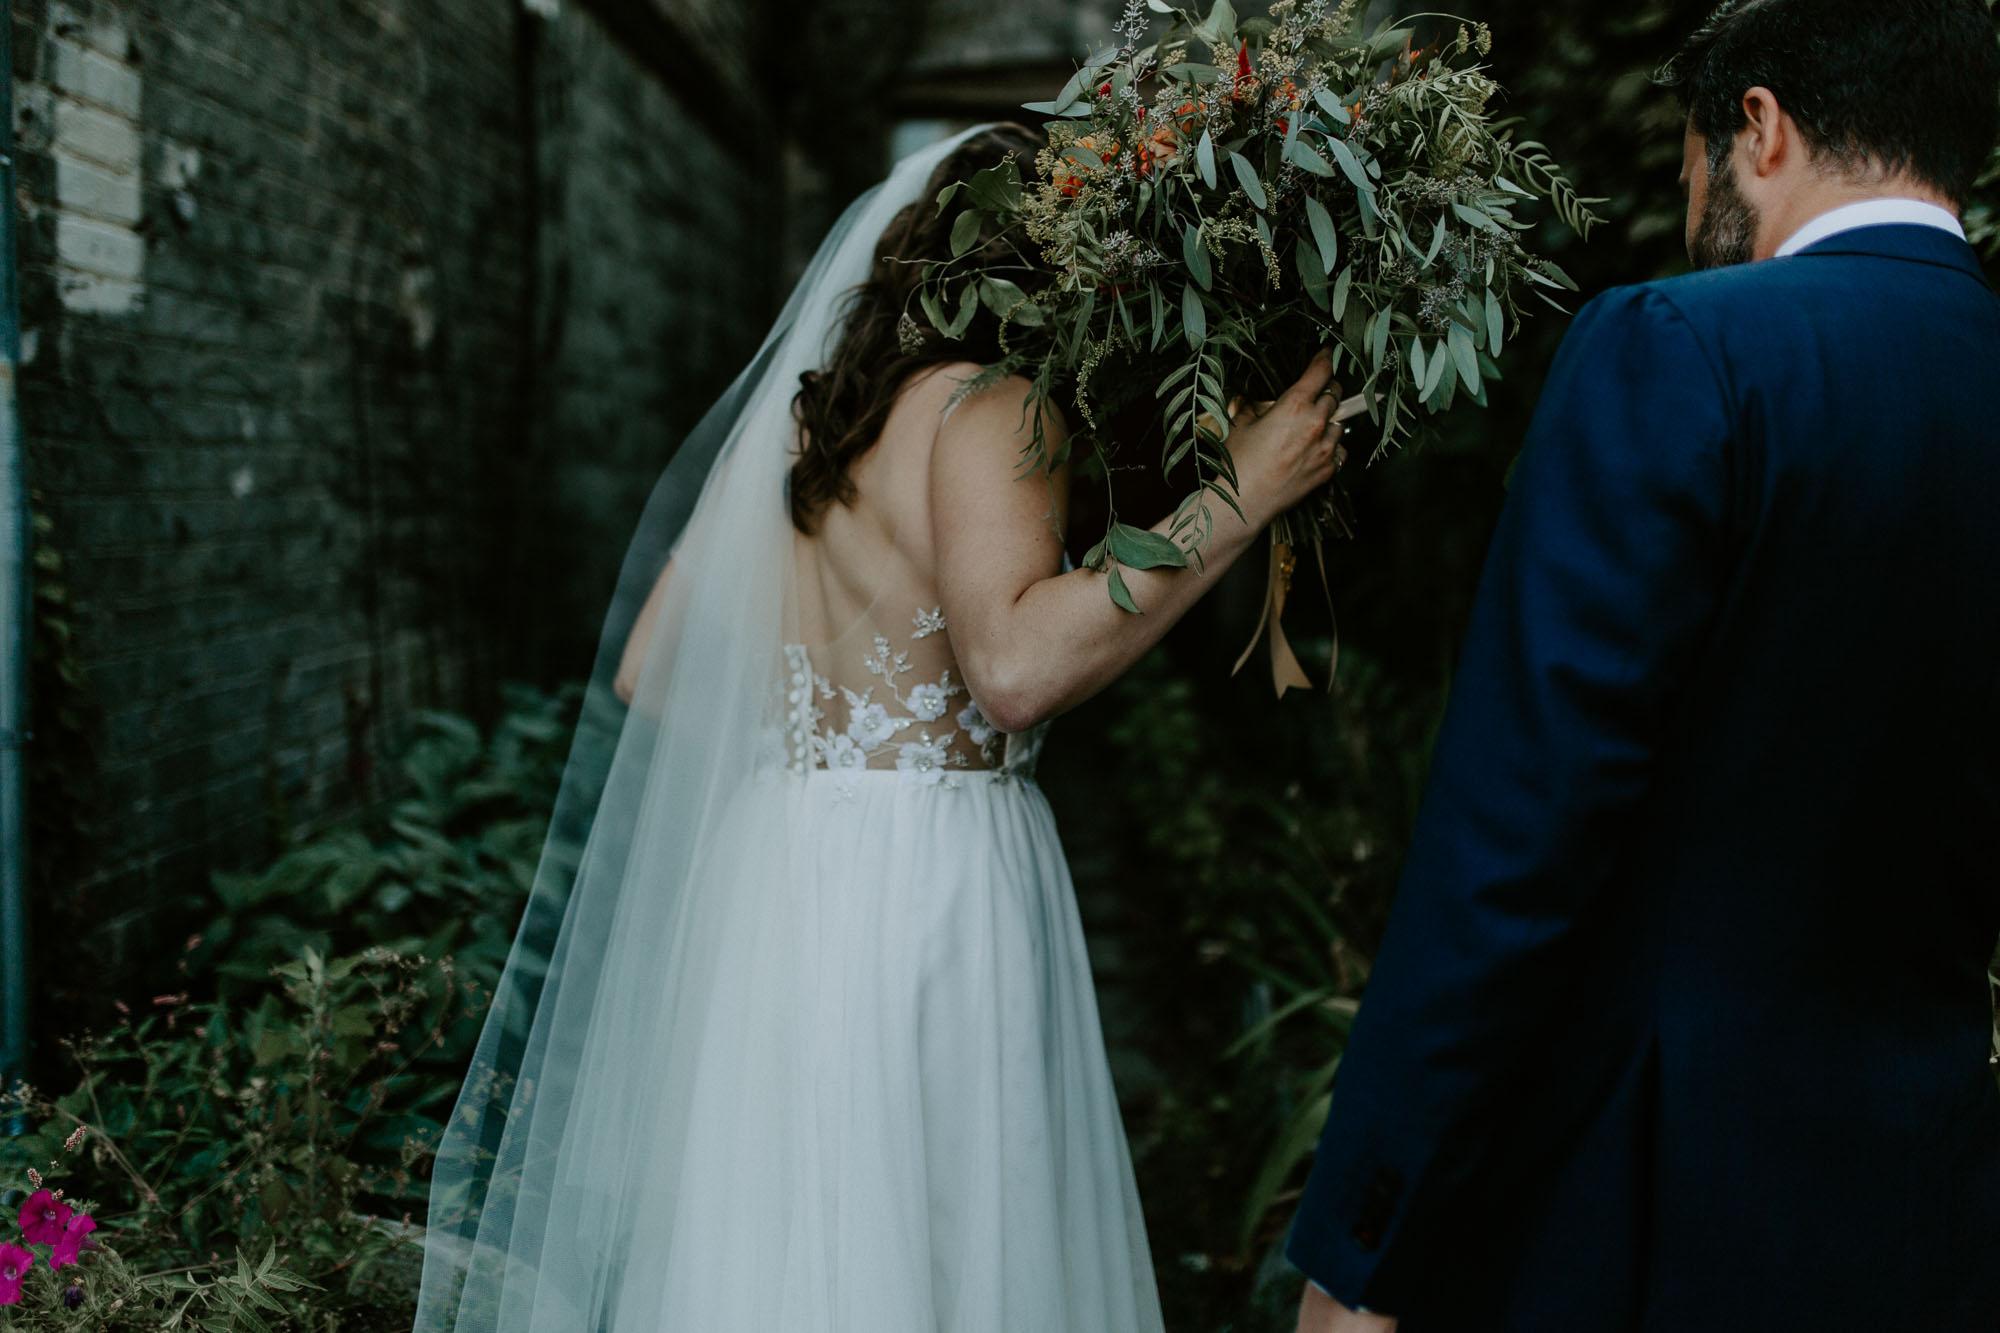 journeyman_distillery_wedding_photographer_chicago_il_wright_photographs-4045.jpg